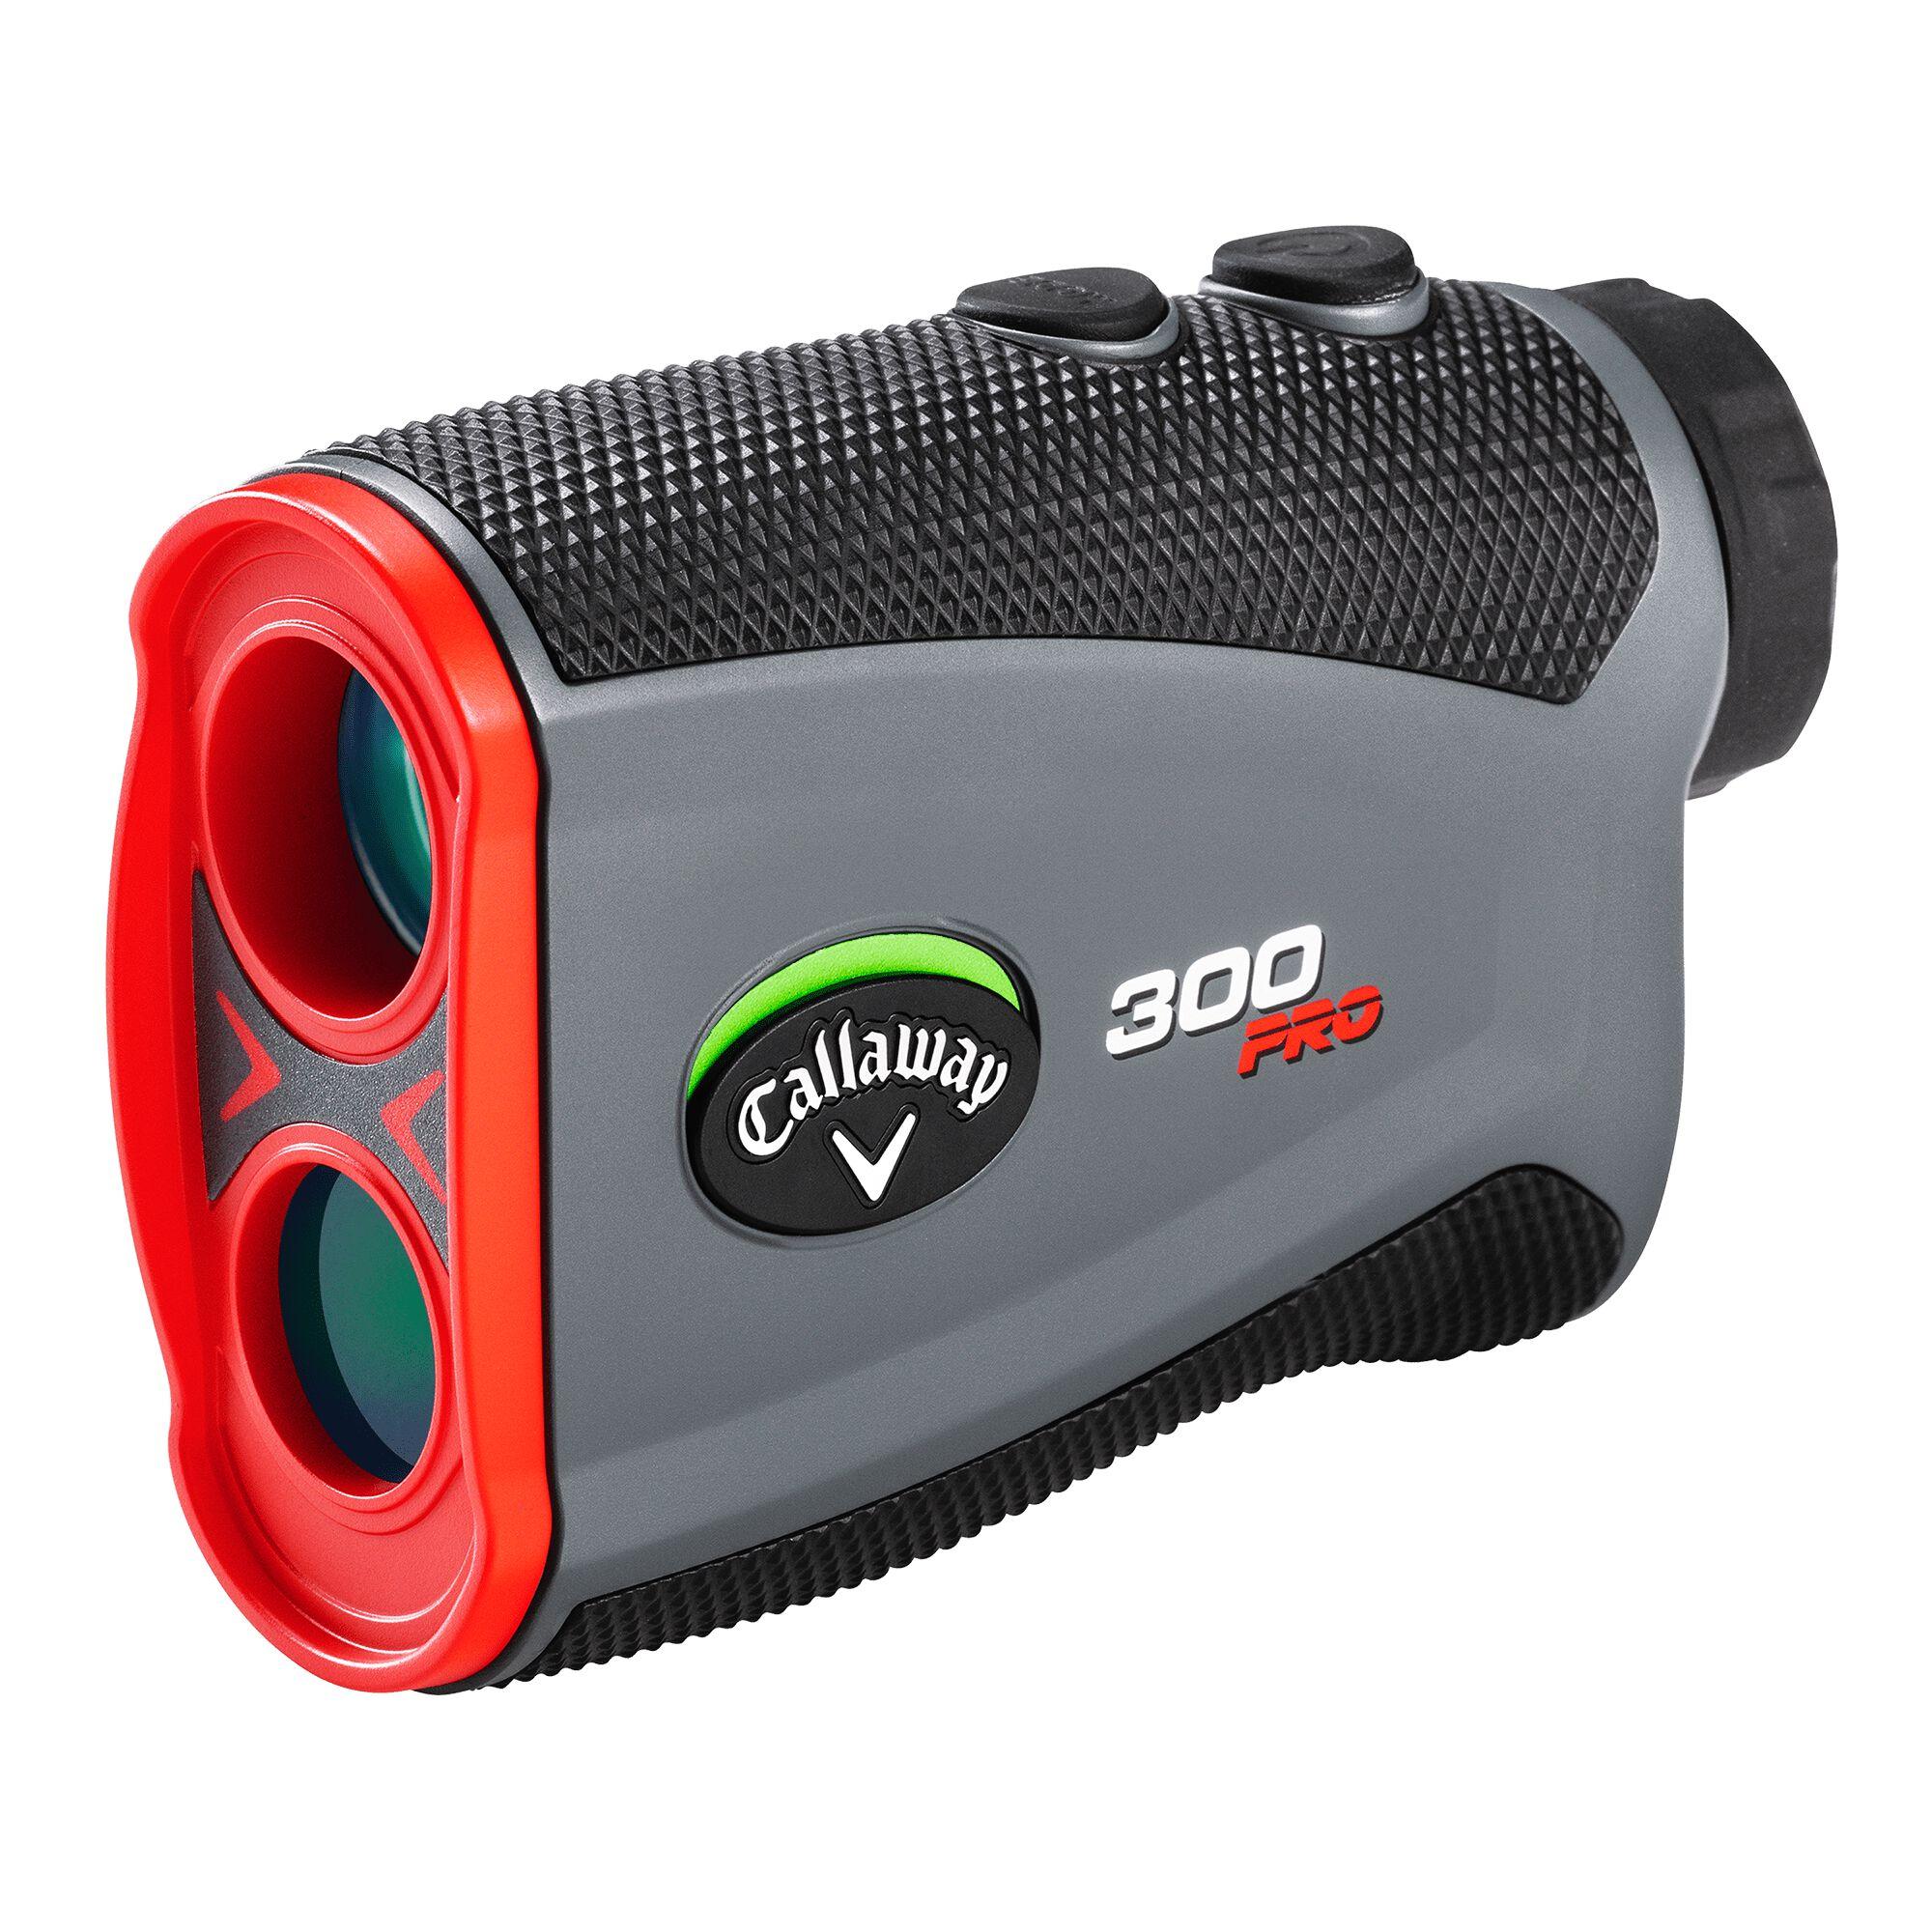 Image of Callaway Golf 300 Pro Laser Rangefinder